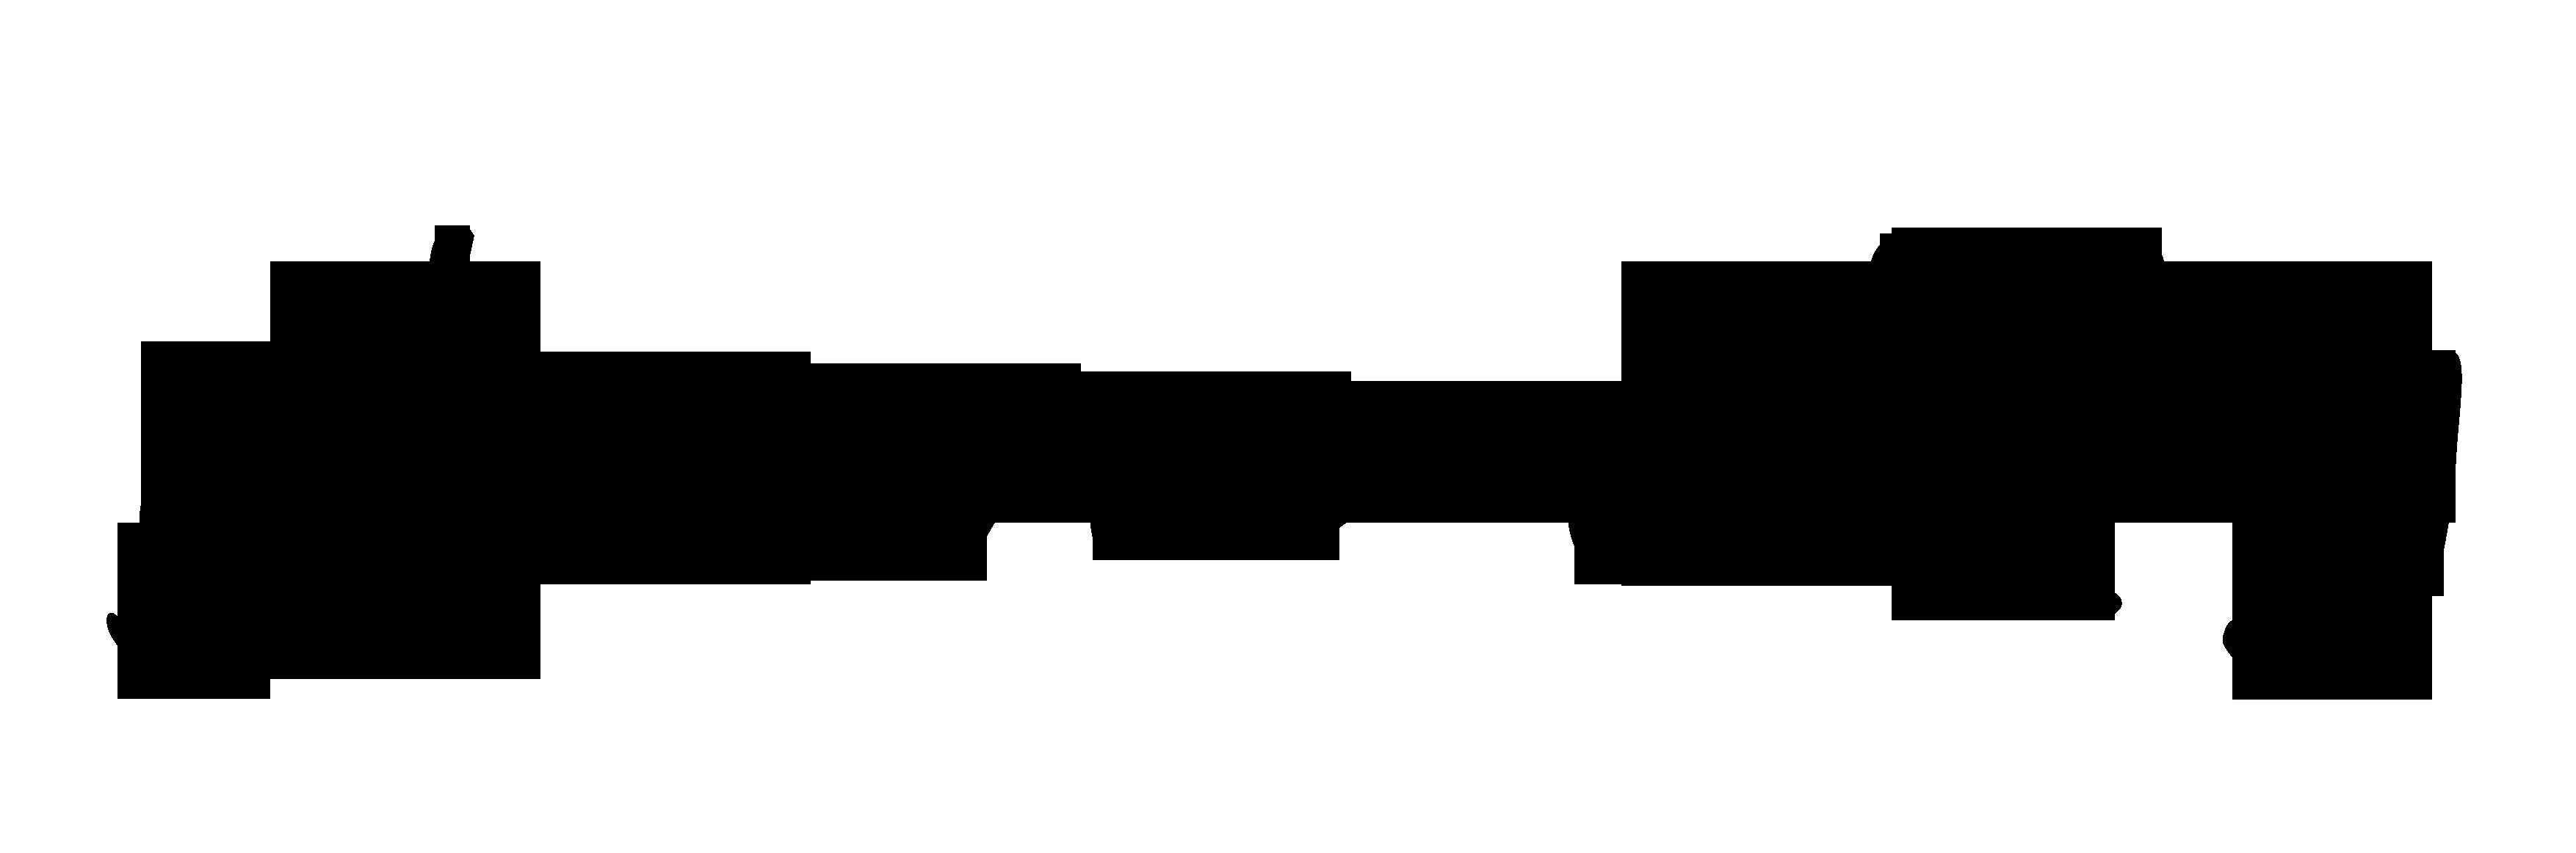 glamcityロゴ